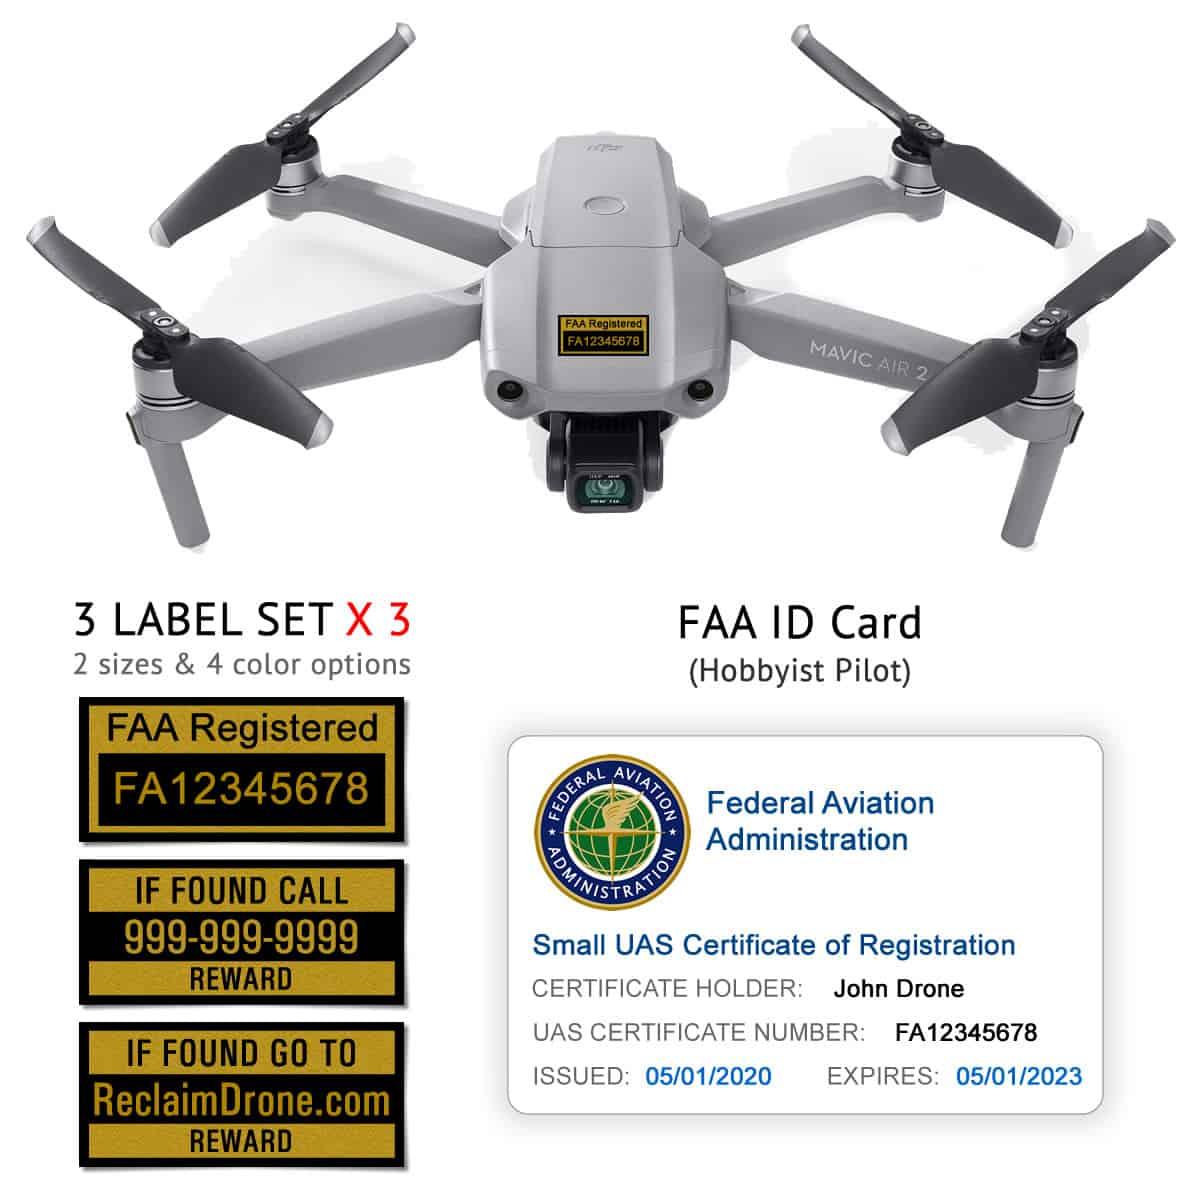 DJI Mavic Air 2 – FAA Identification Bundle, FAA Registration Number Labels and Registration ID Card for Hobbyists-hobbyist-Mavic-Air-2-1-gold-1200px